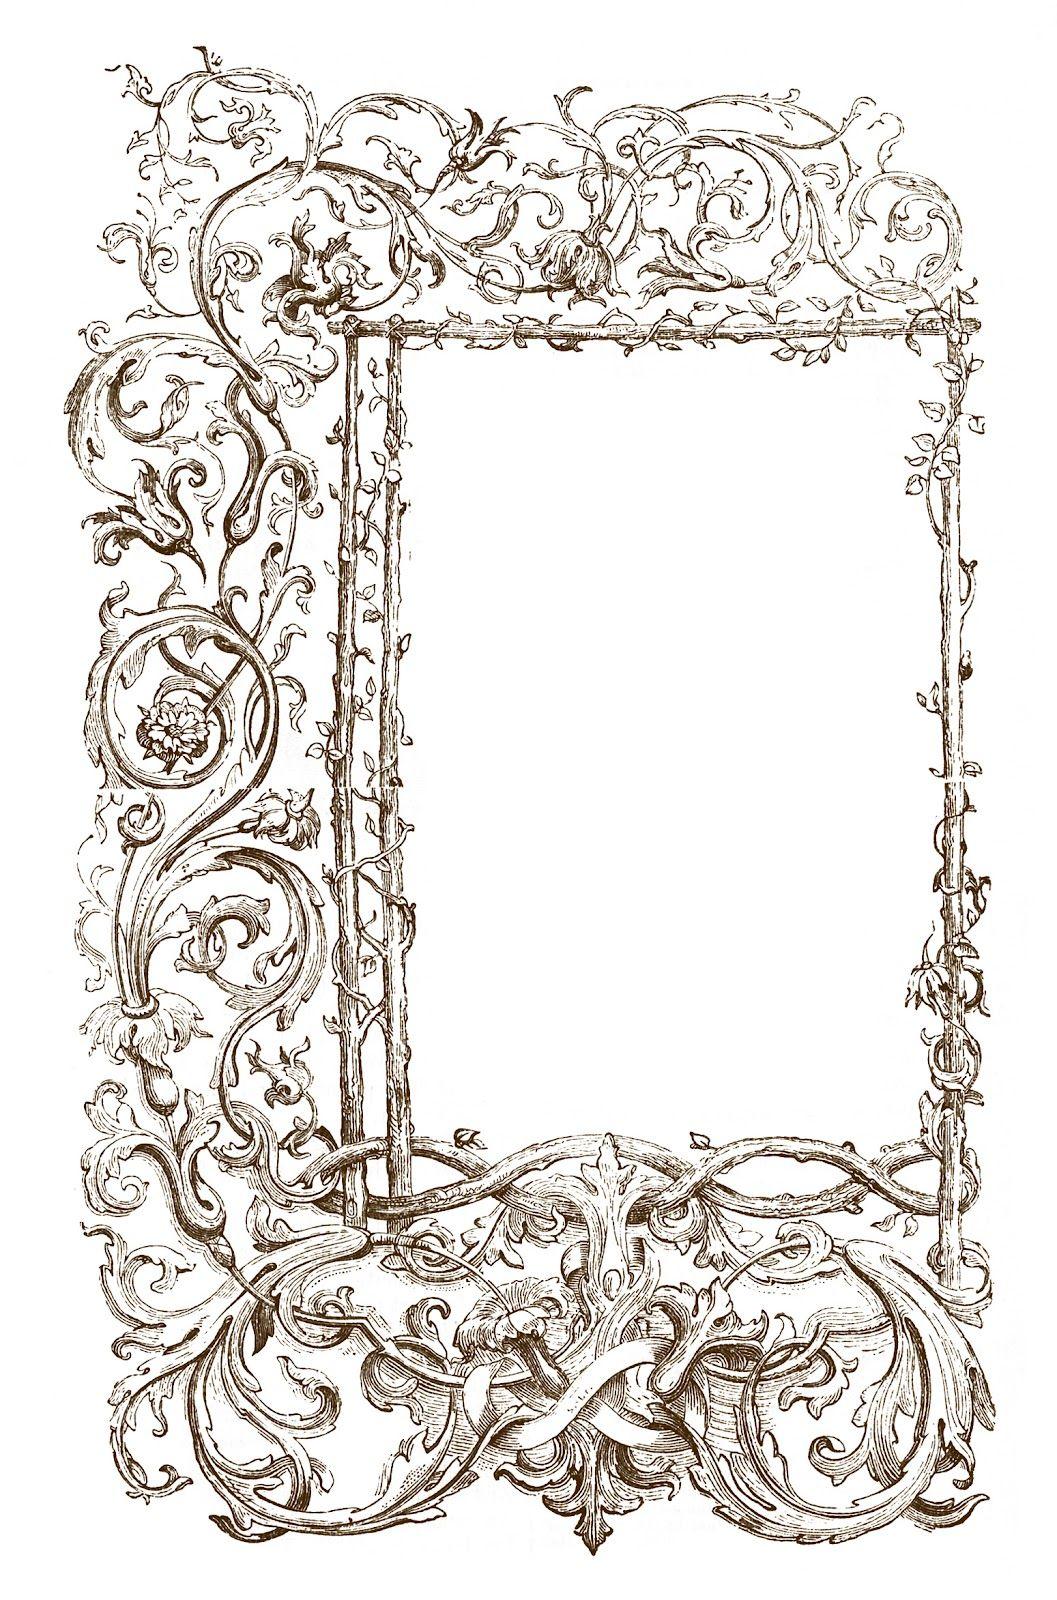 Vintage Clip Art - Faux Bois Frames with Scrolls | Pinterest ...